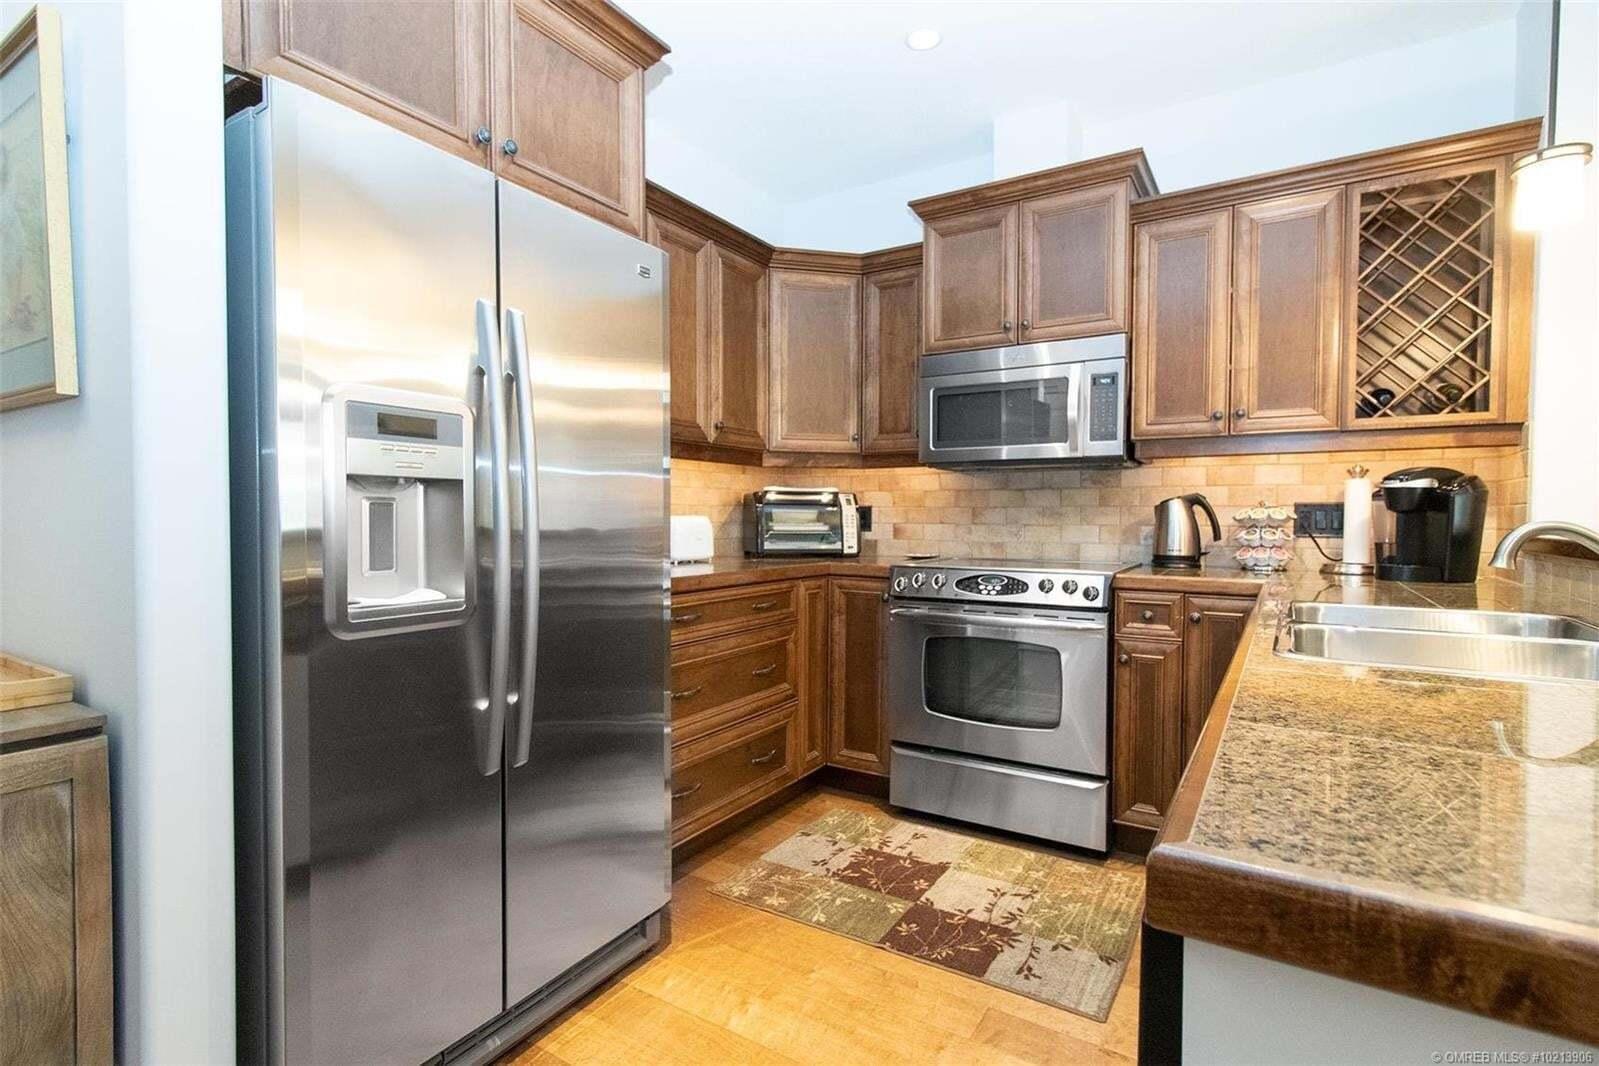 Condo for sale at 2750 Auburn Rd Unit 302 West Kelowna British Columbia - MLS: 10213906